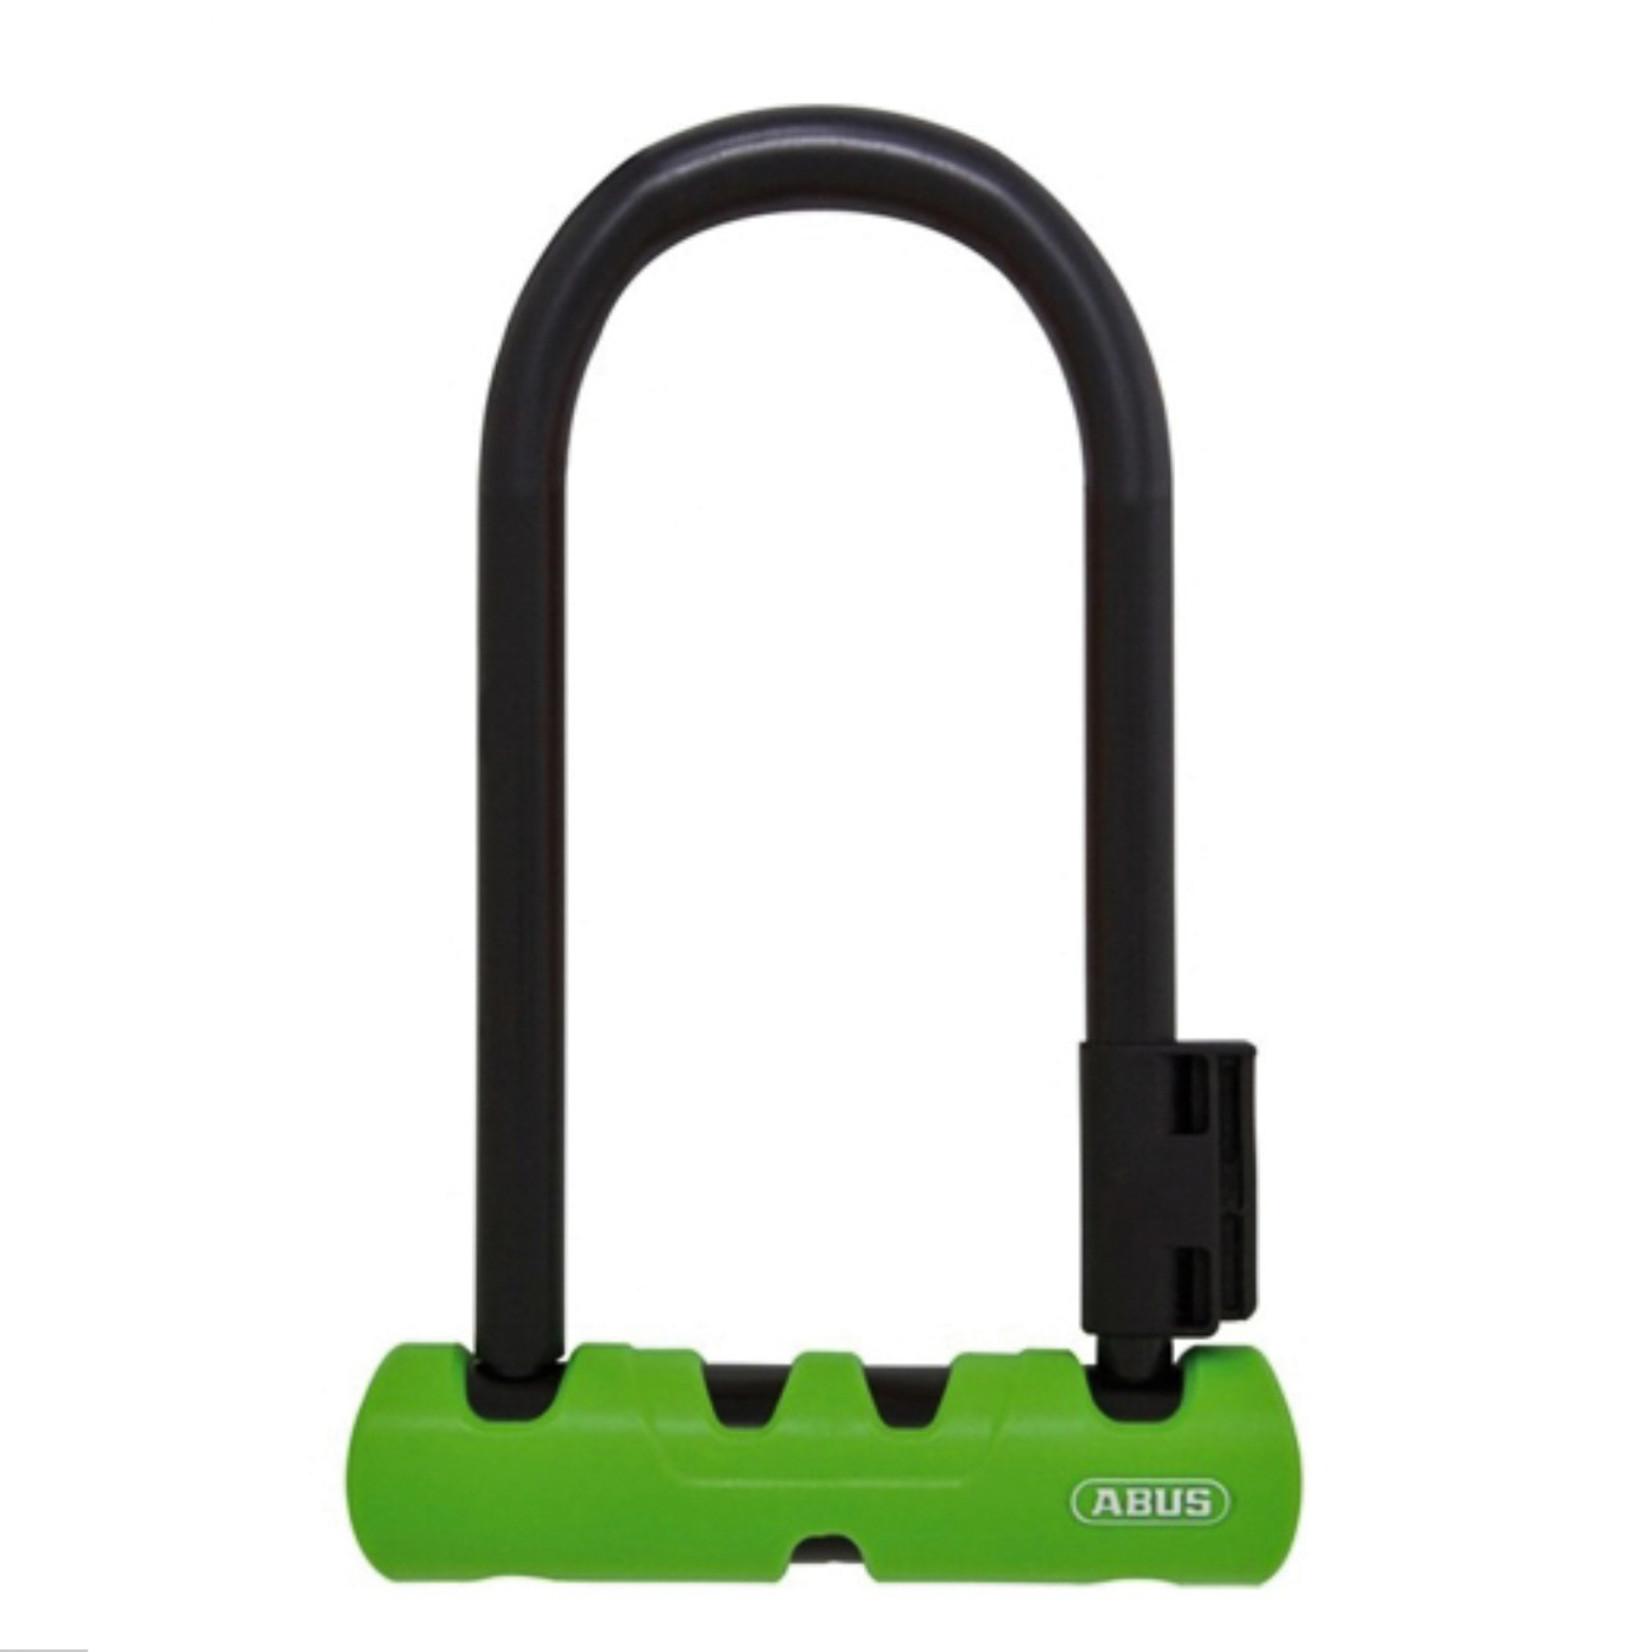 Abus Ultra 410 U-Lock (17x 23cm)